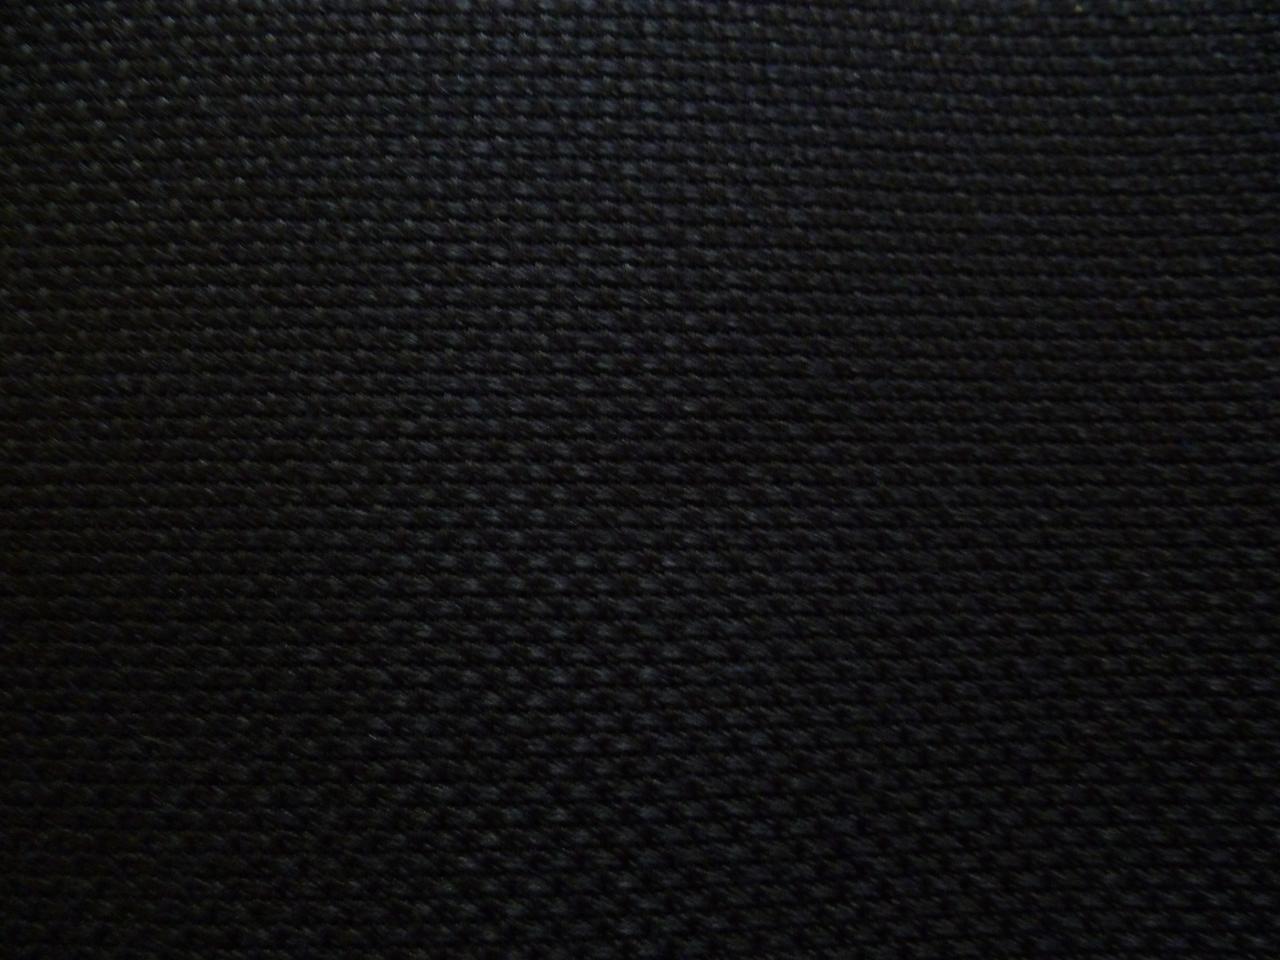 aida-noir-5-5.jpg